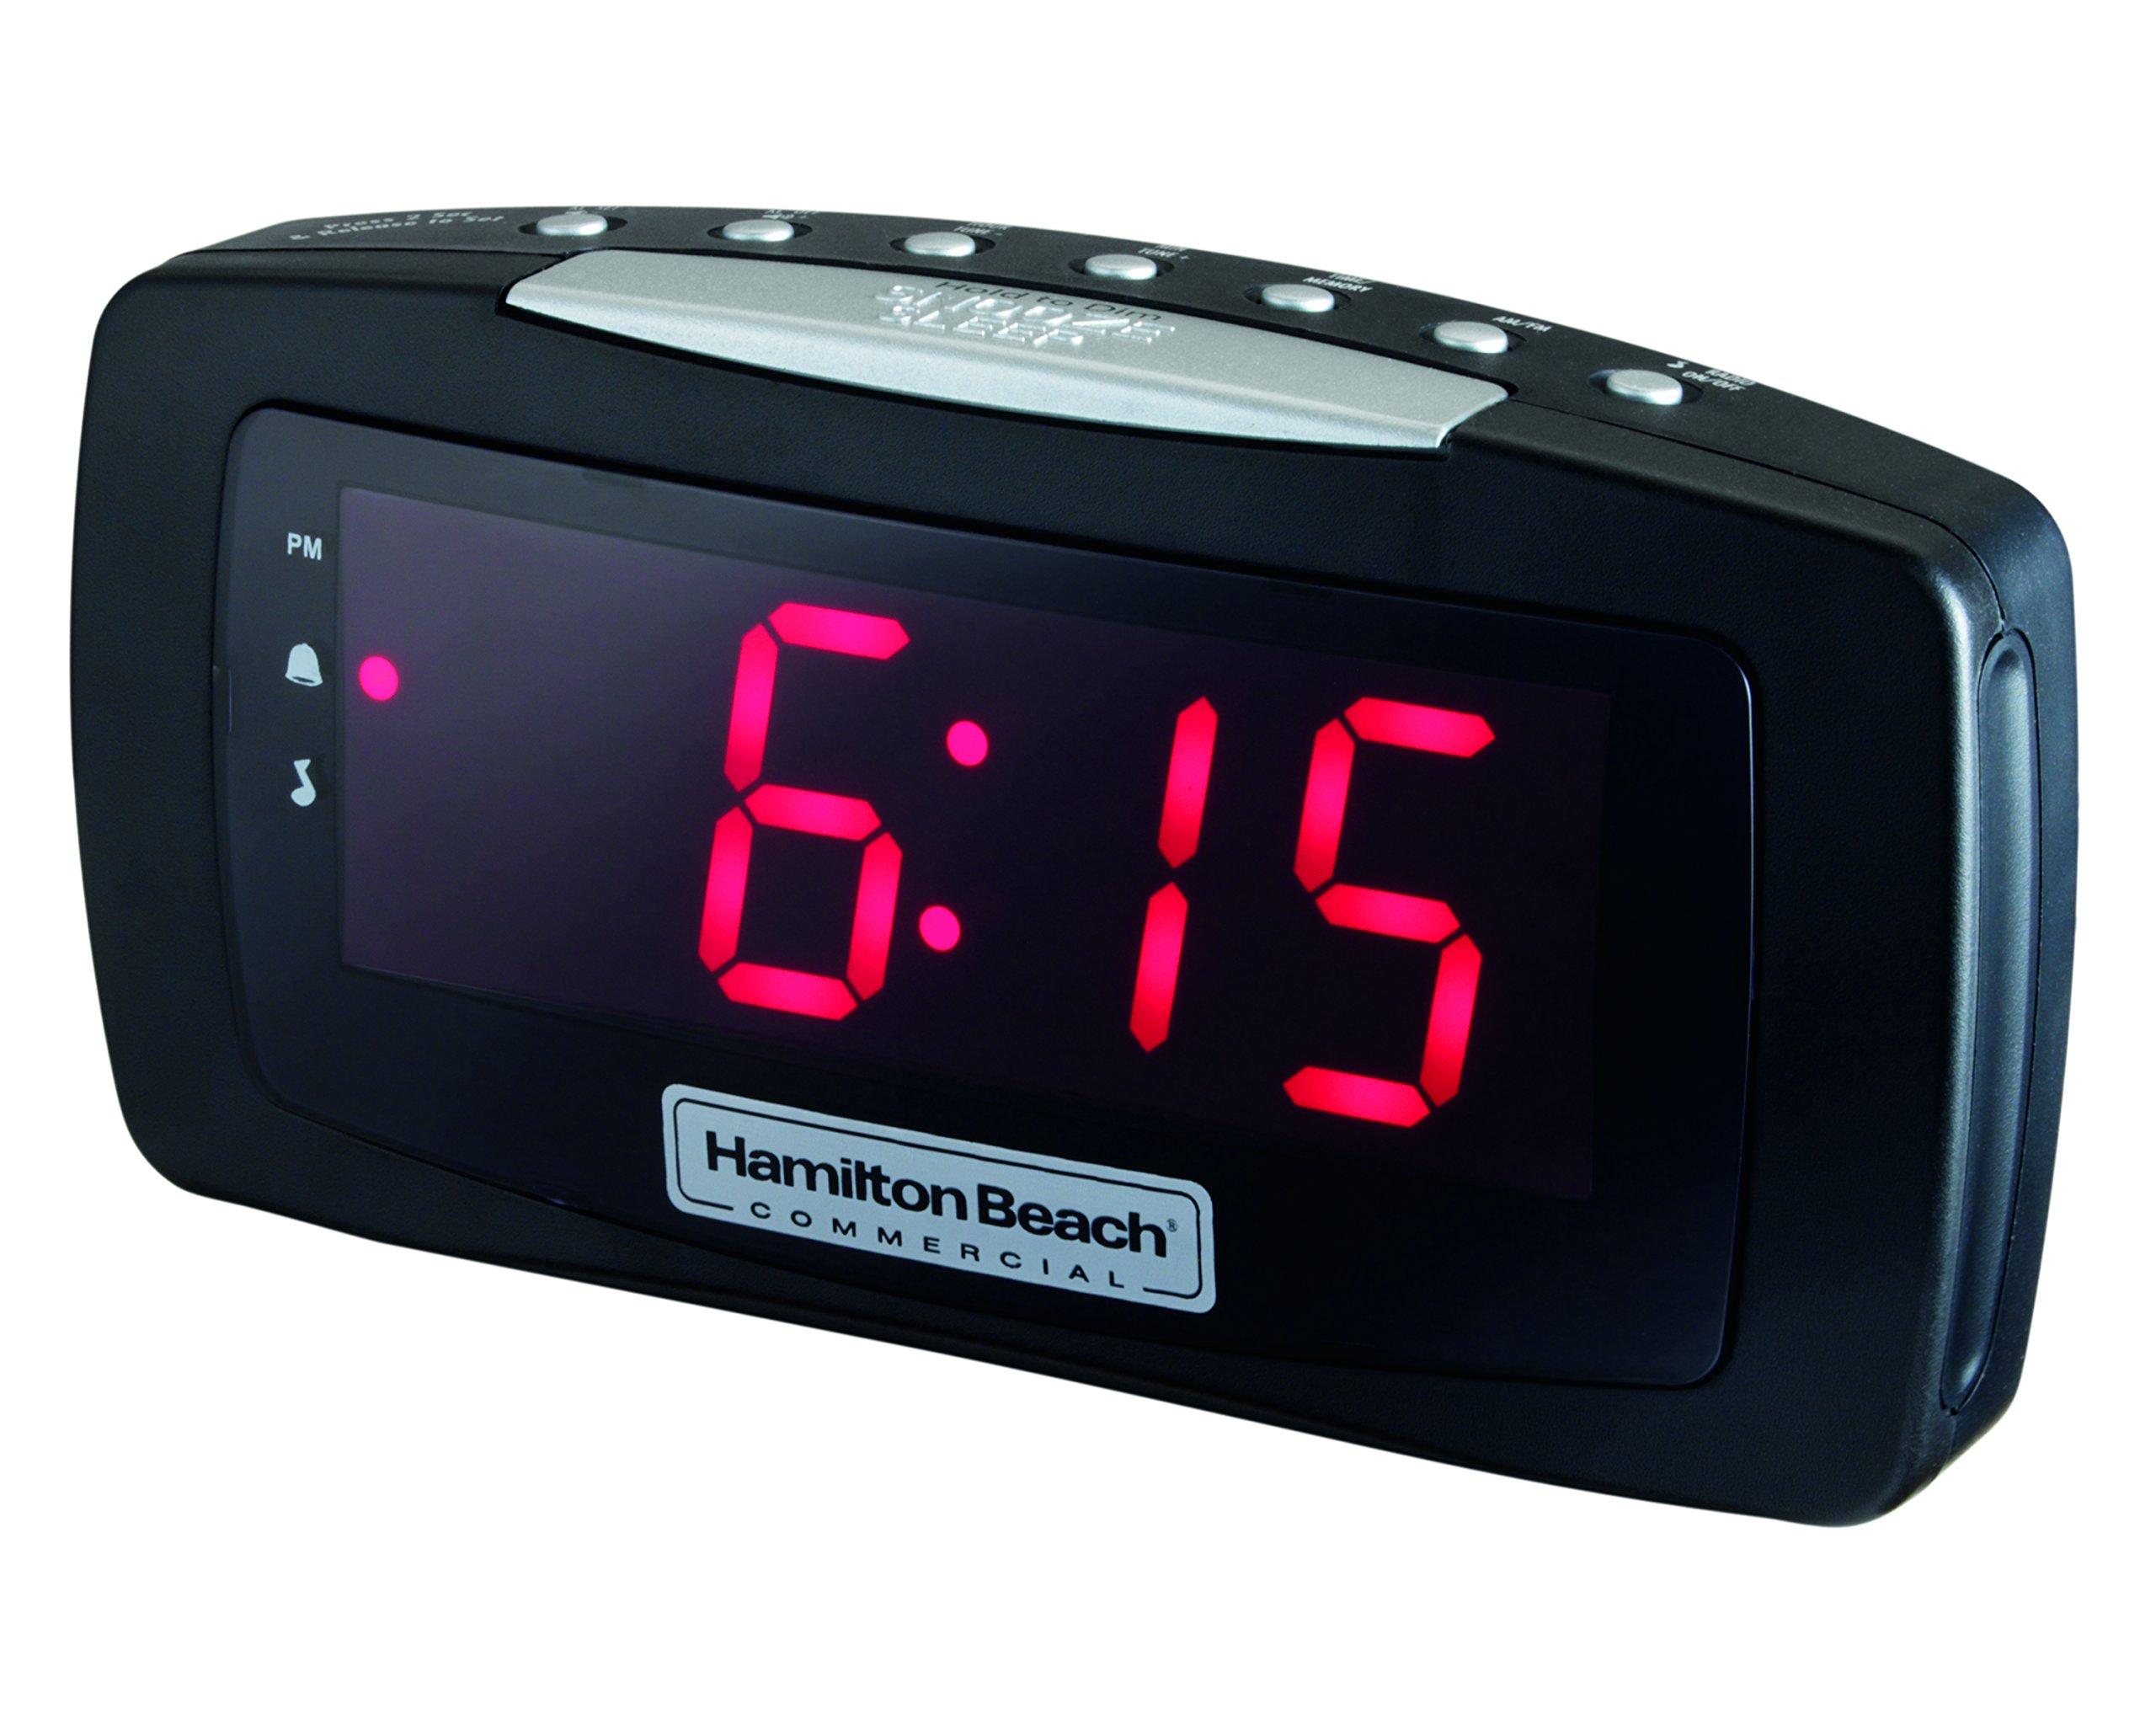 Hospitality Clock Radio Alarm Clock with Large Display and Snooze Button HCR330 by Hamilton Beach